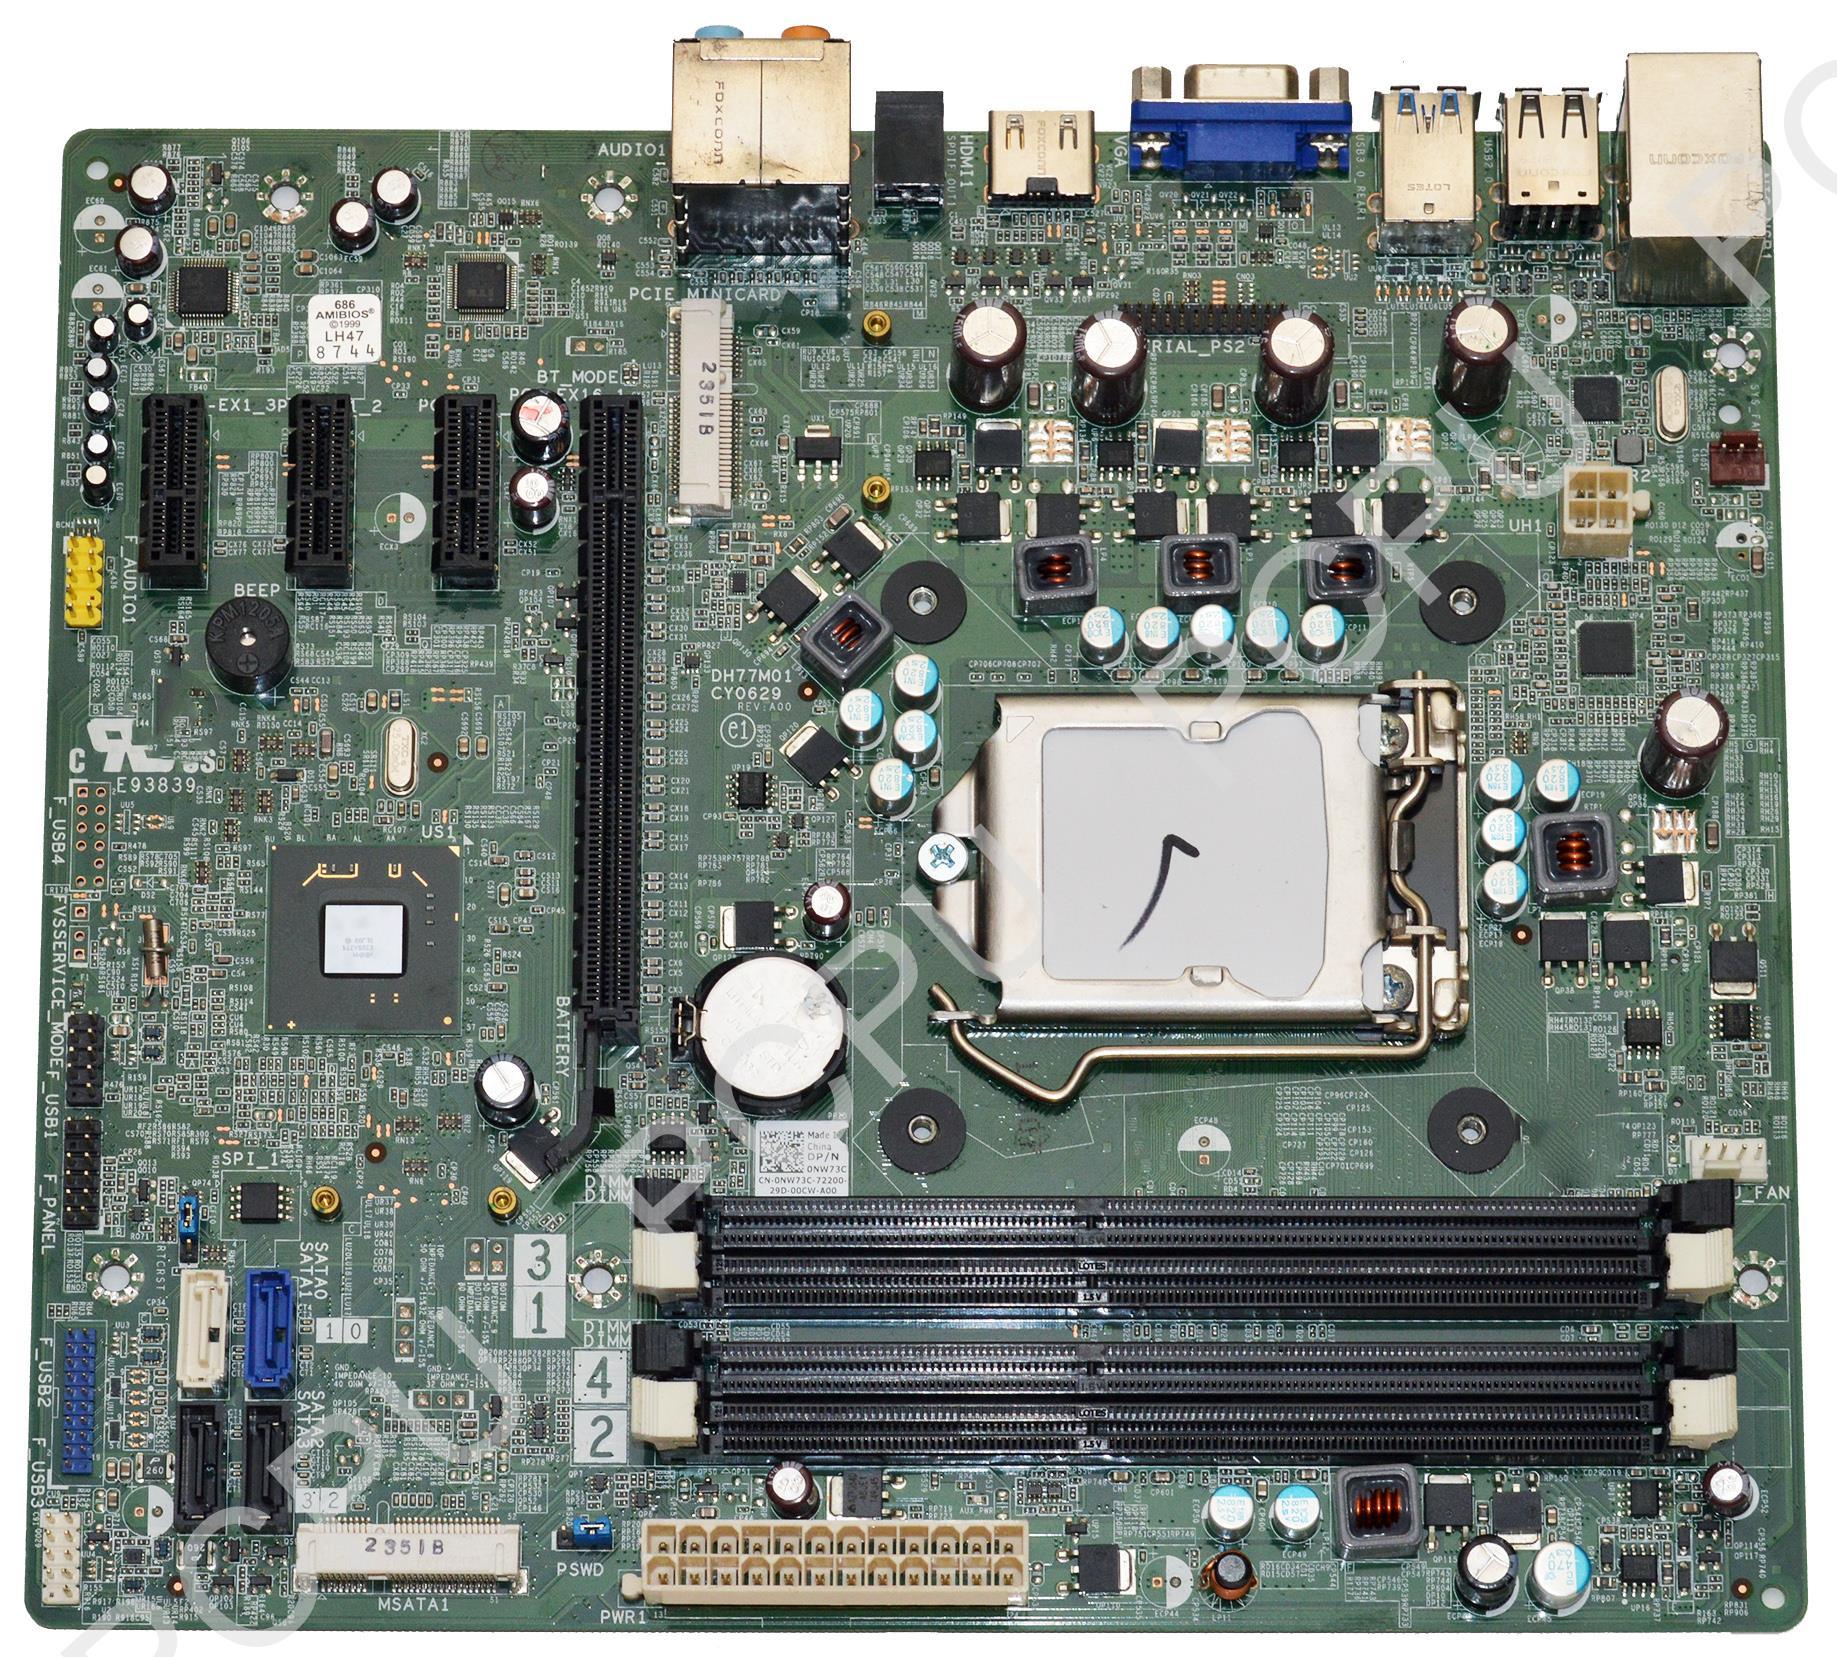 NW73C Dell Studio XPS 8500 Vostro 470 Intel Desktop Mothe...